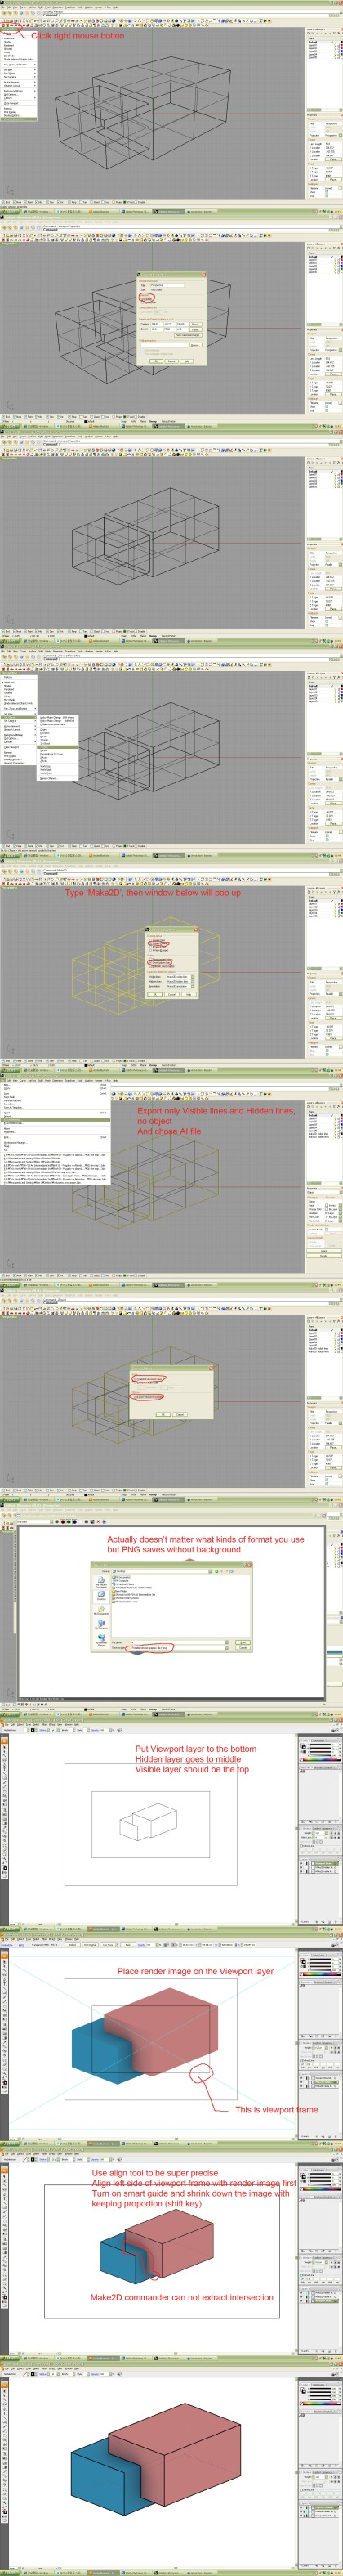 render-with-vector-line